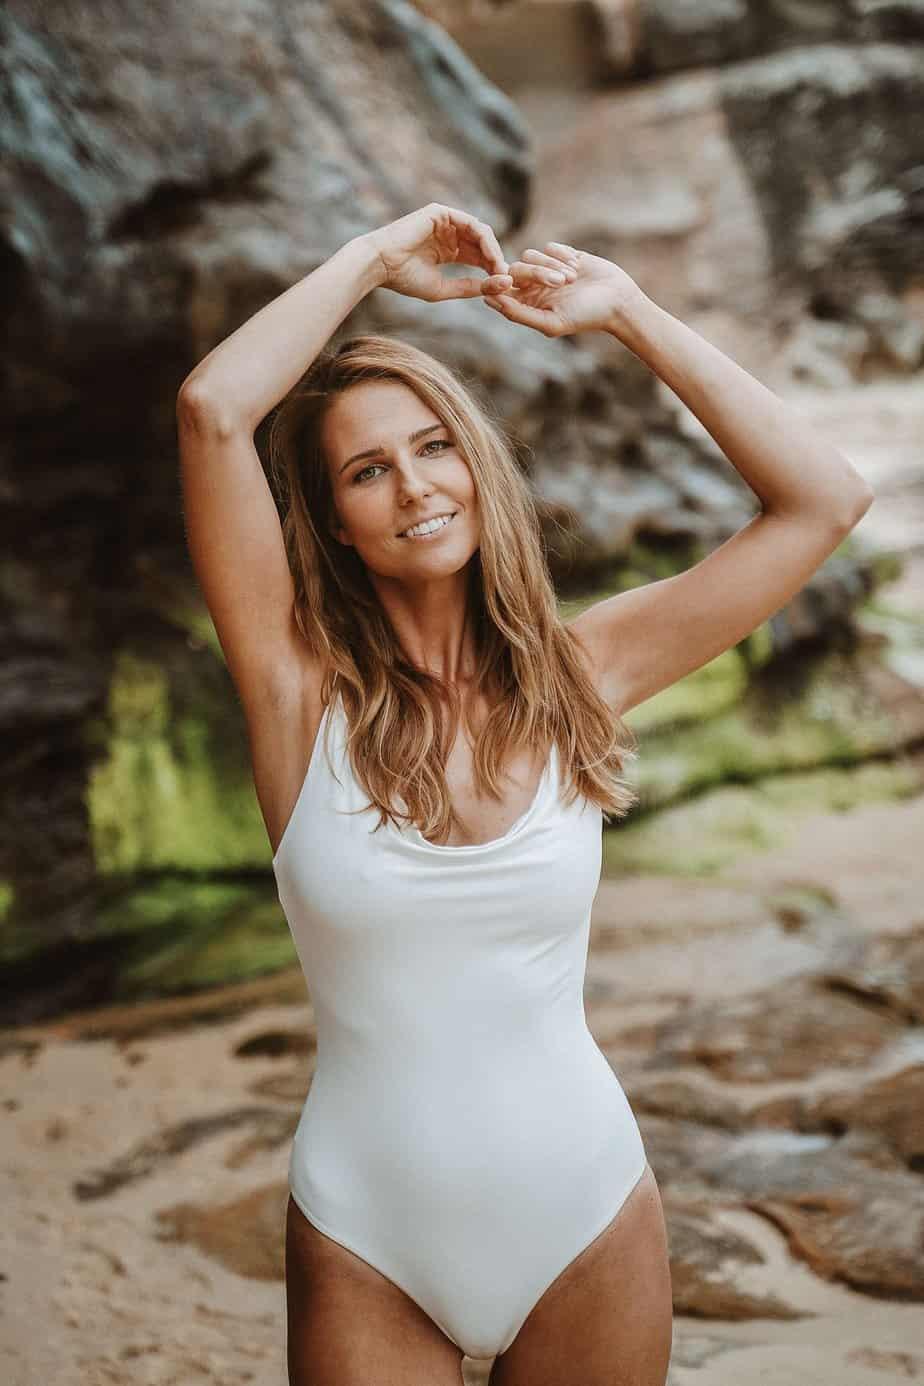 Isabella_francescabandiera_Sydney_portrait_